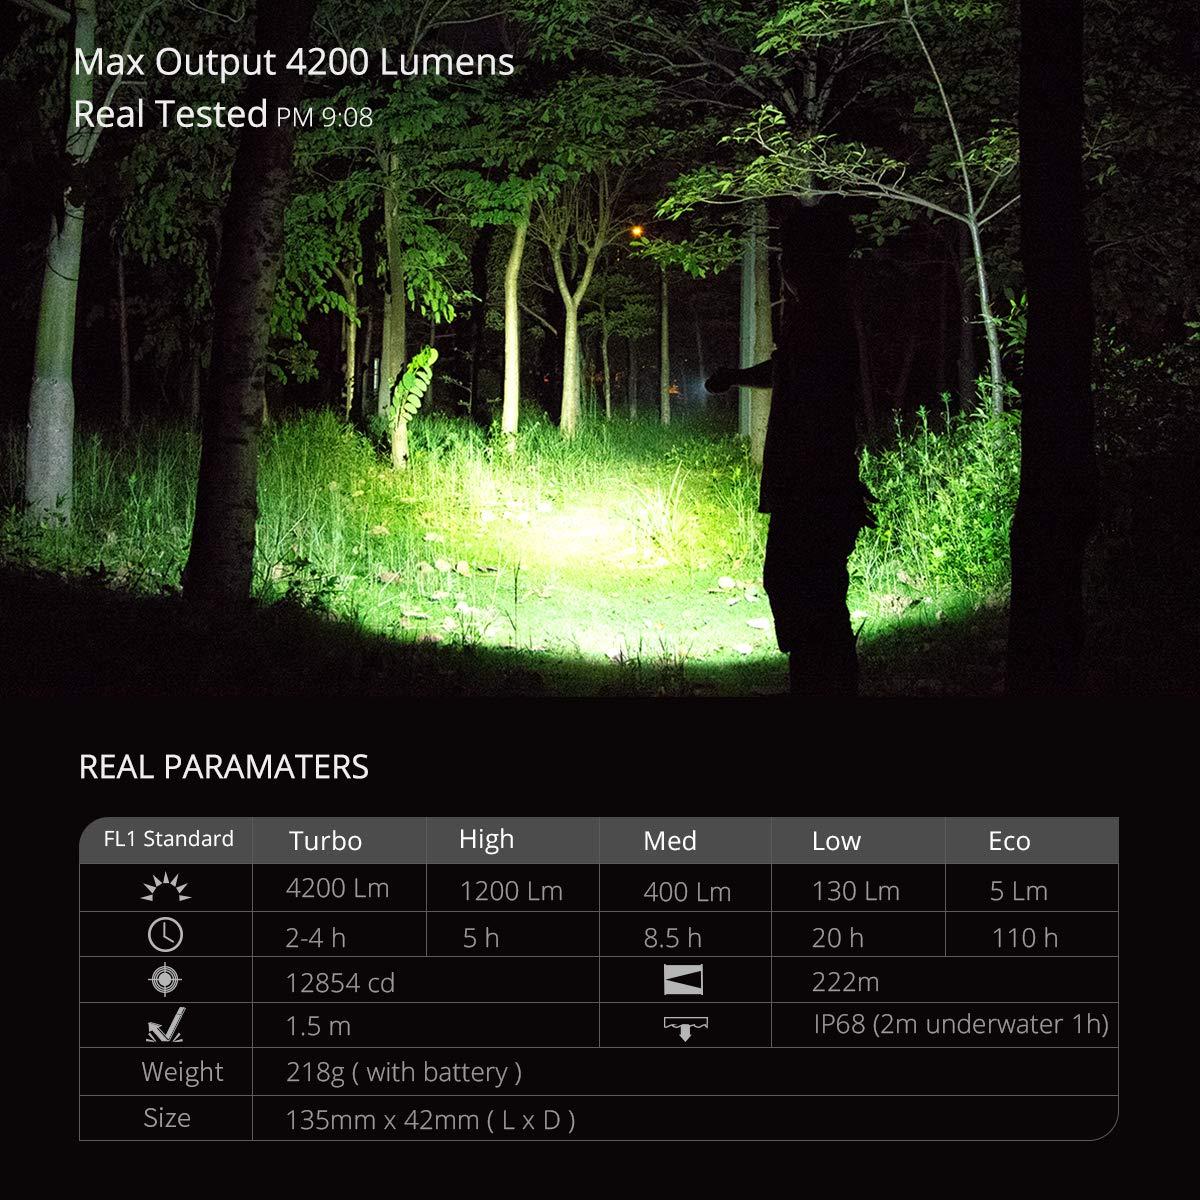 Linternas Led Alta Potencia Recargable 4200 L/úmenes,WUBEN T70 CREE XHP70.2 LED Blanco c/álido 5000K Impermeable Linterna Militar Tactica con 26650 bater/ía para Actividades al aire libre y acampar